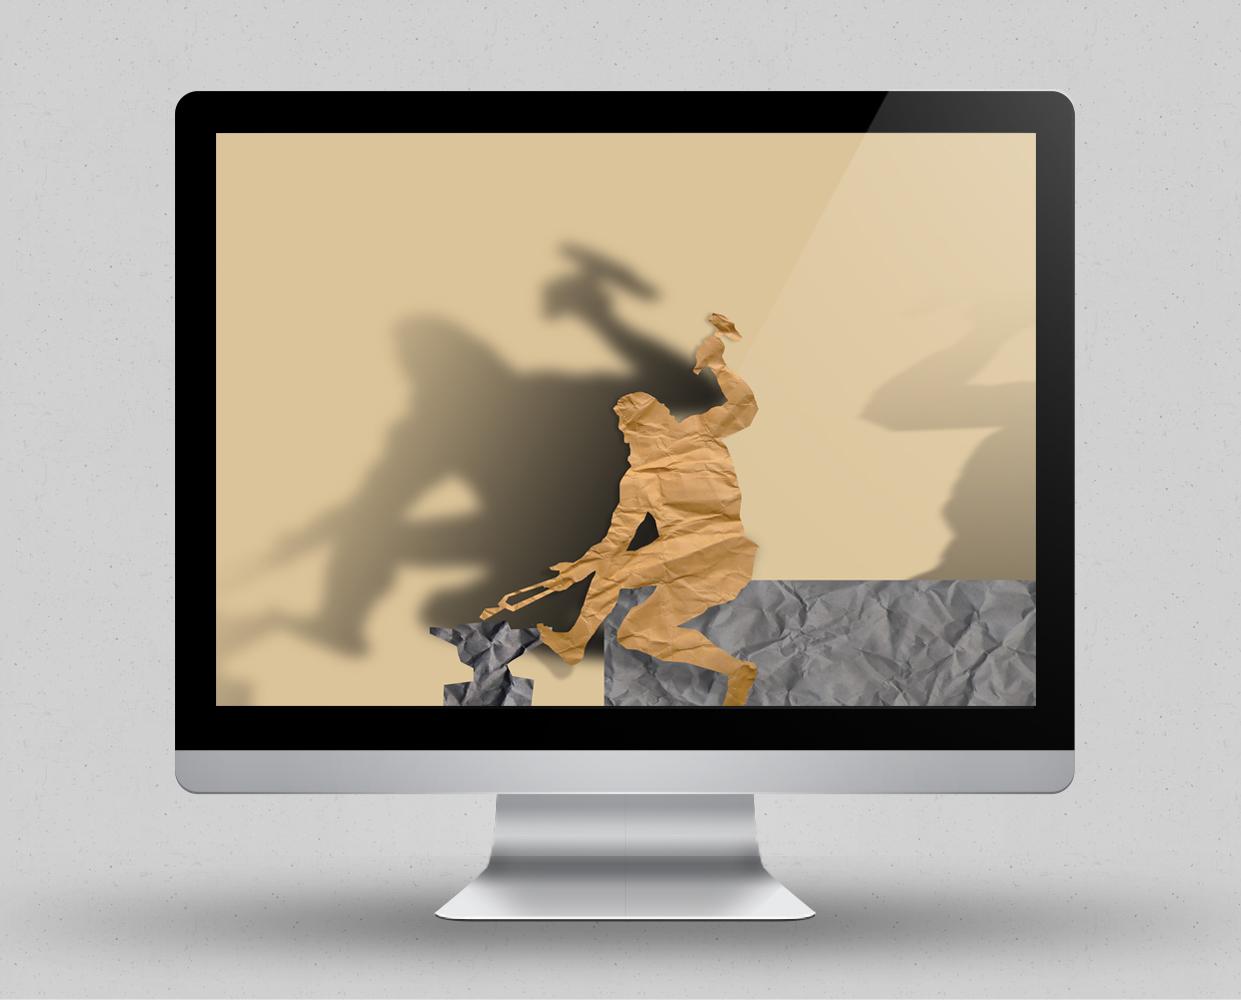 crossing_stages_ilustracion_02.jpg